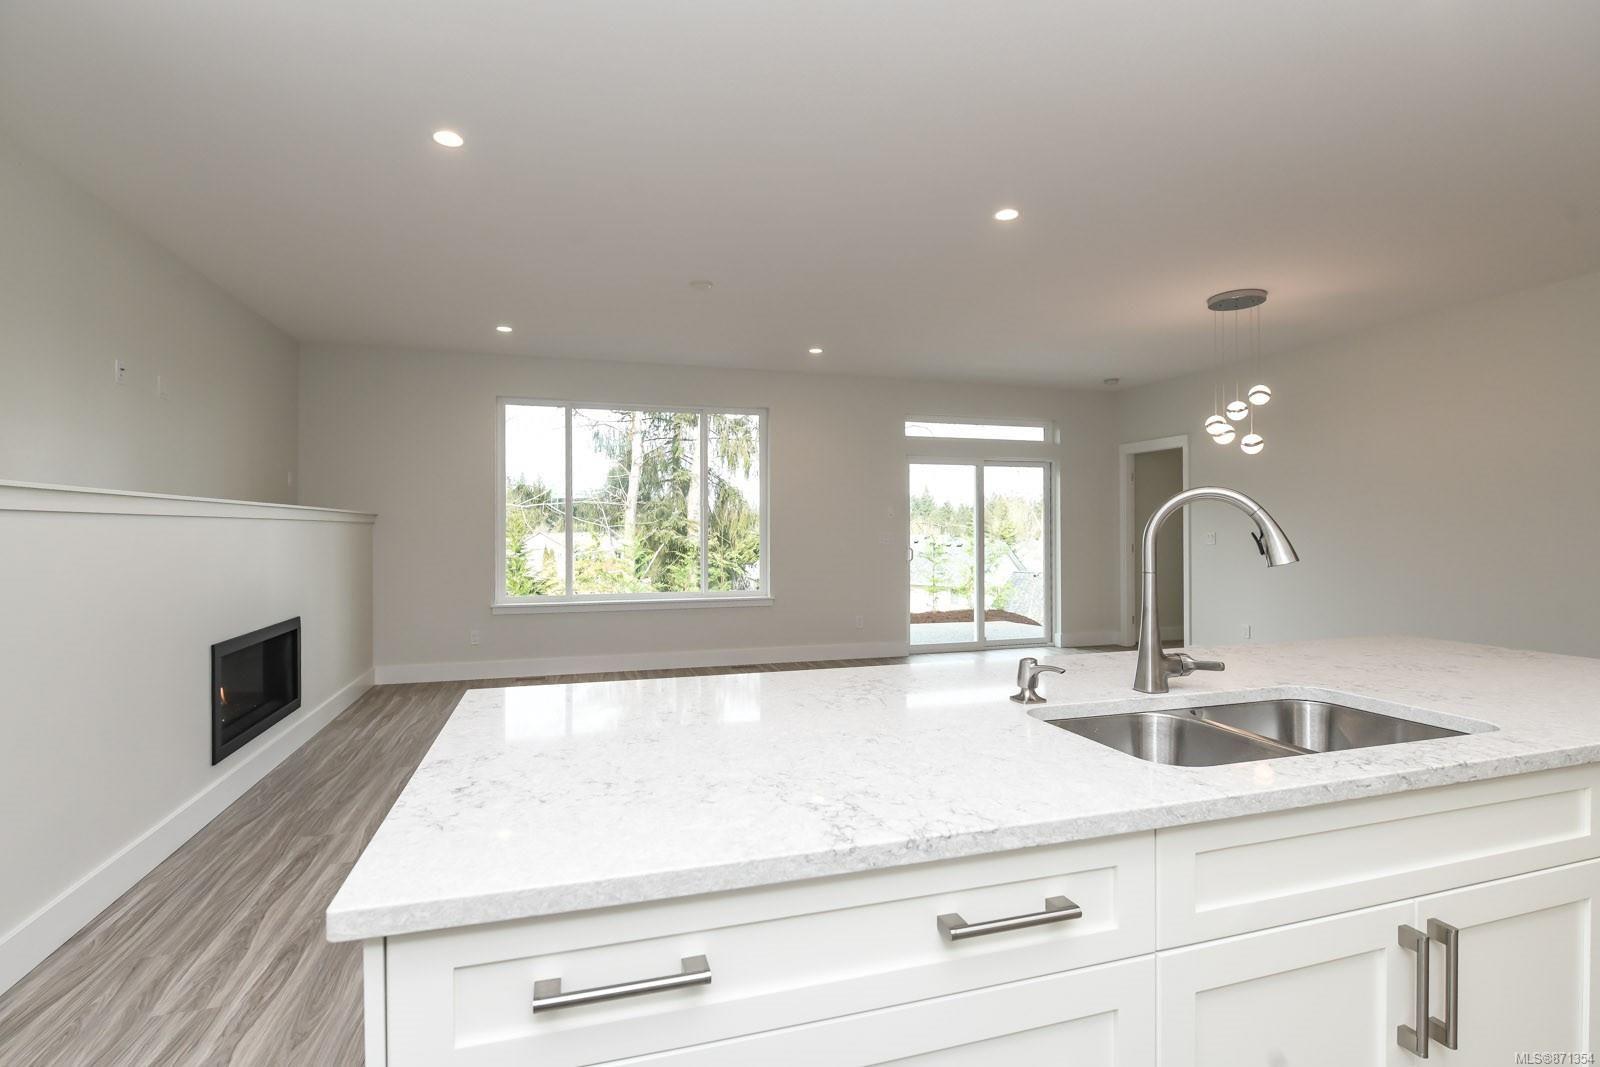 Photo 5: Photos: 68 Grayhawk Pl in : CV Courtenay City House for sale (Comox Valley)  : MLS®# 871354